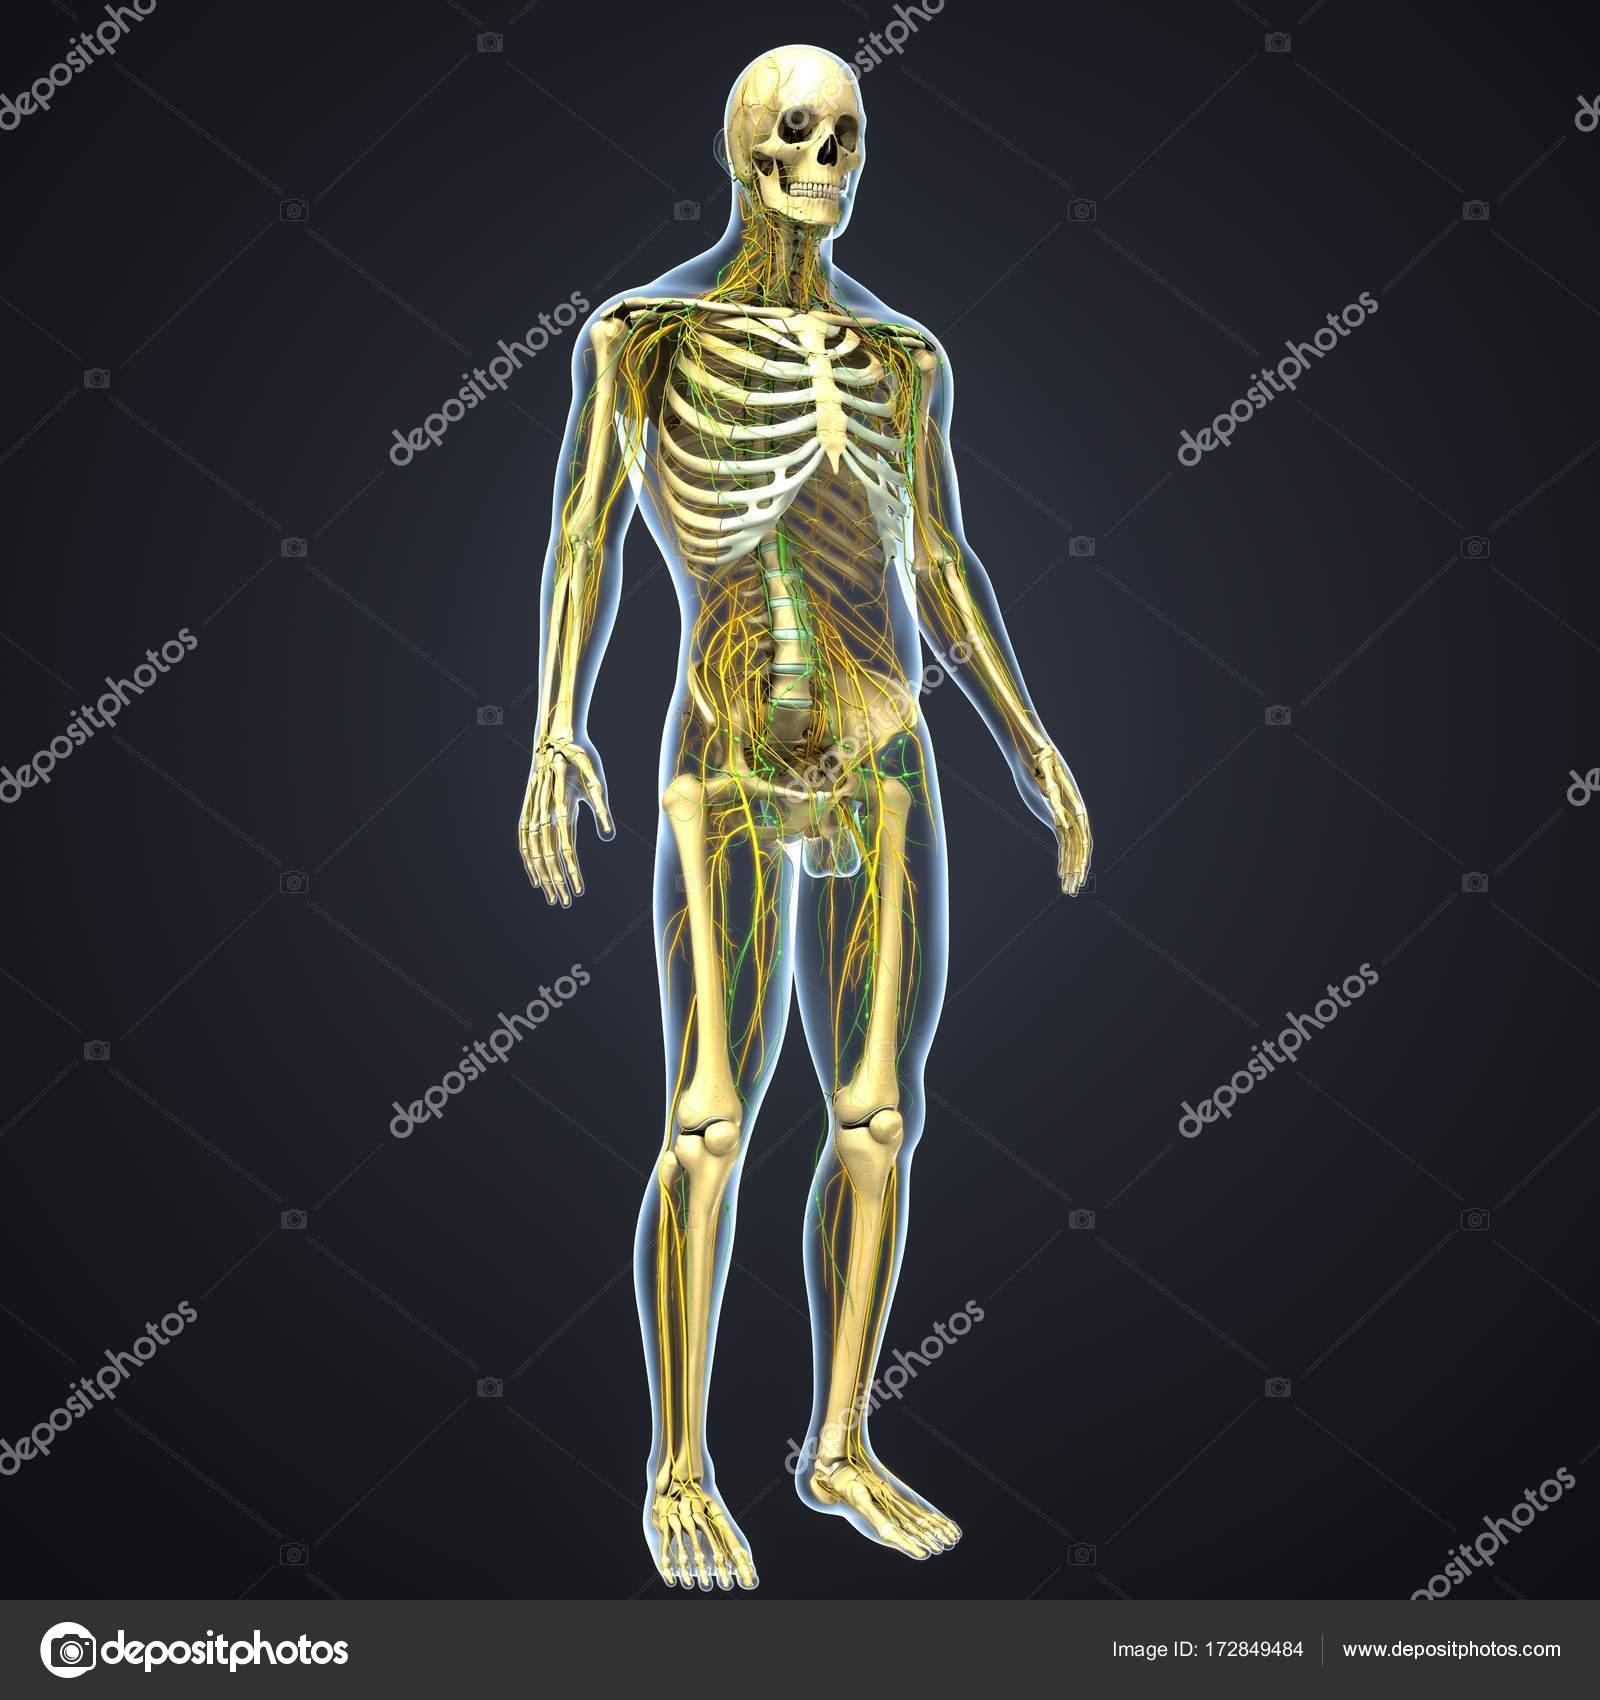 Nervensystem und Lymphknoten — Stockfoto © sciencepics #172849484